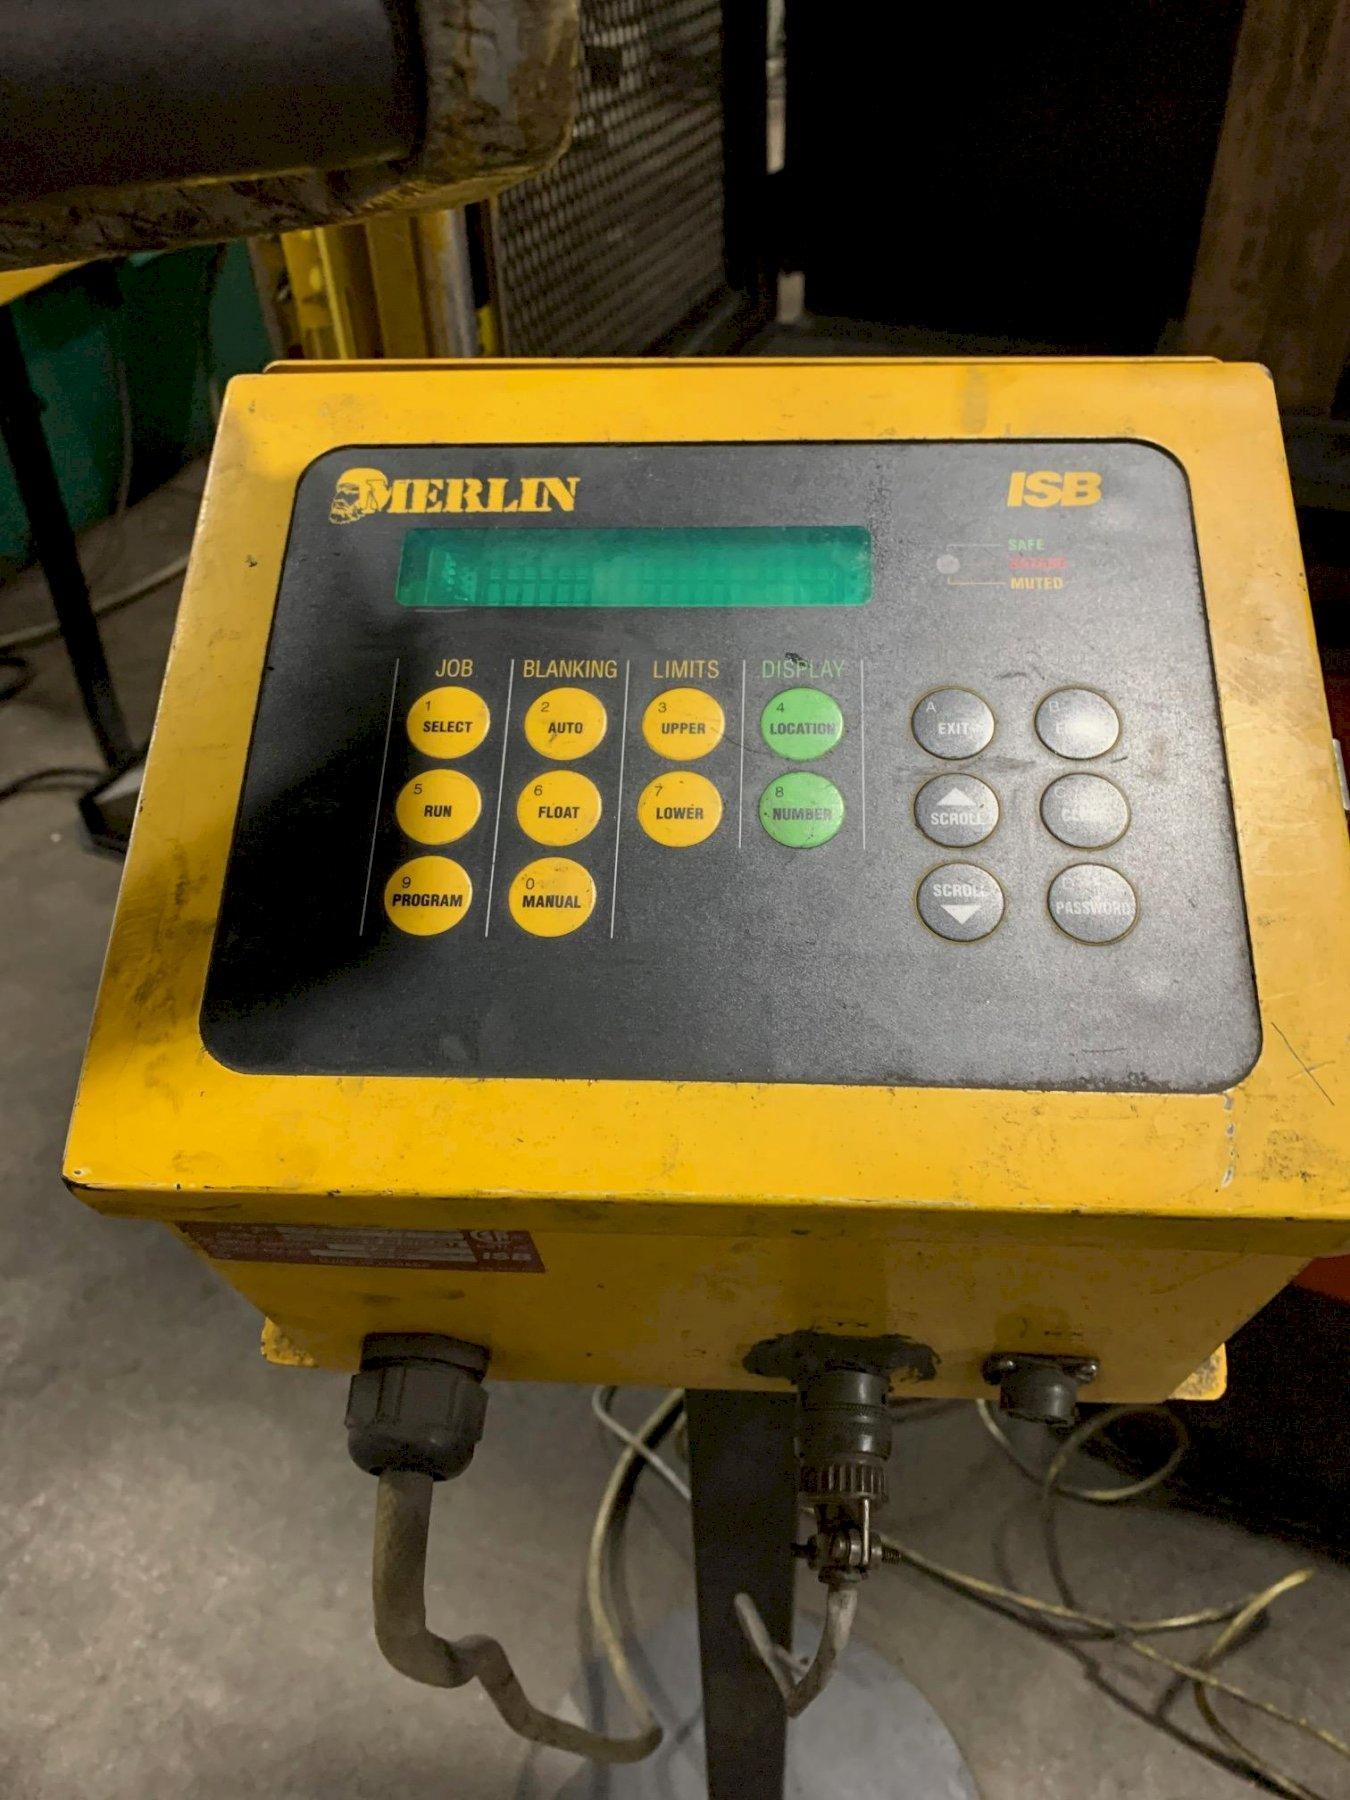 USED AMADA 187 TON X 10' MODEL HFE 1703S 6-AXIS HYDRAULIC DOWNACTING CNC PRESS BRAKE, Stock# 107